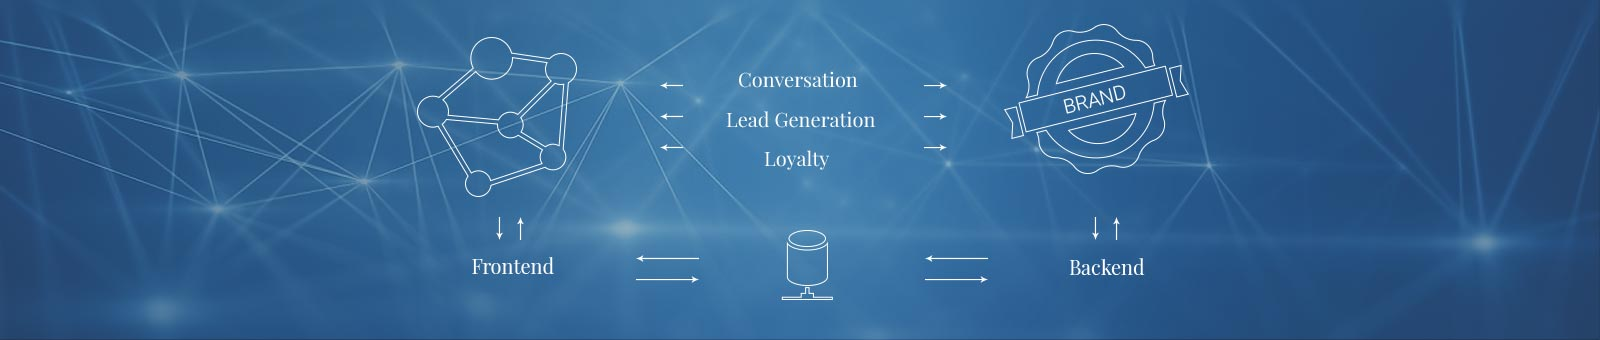 social_networking_scheme